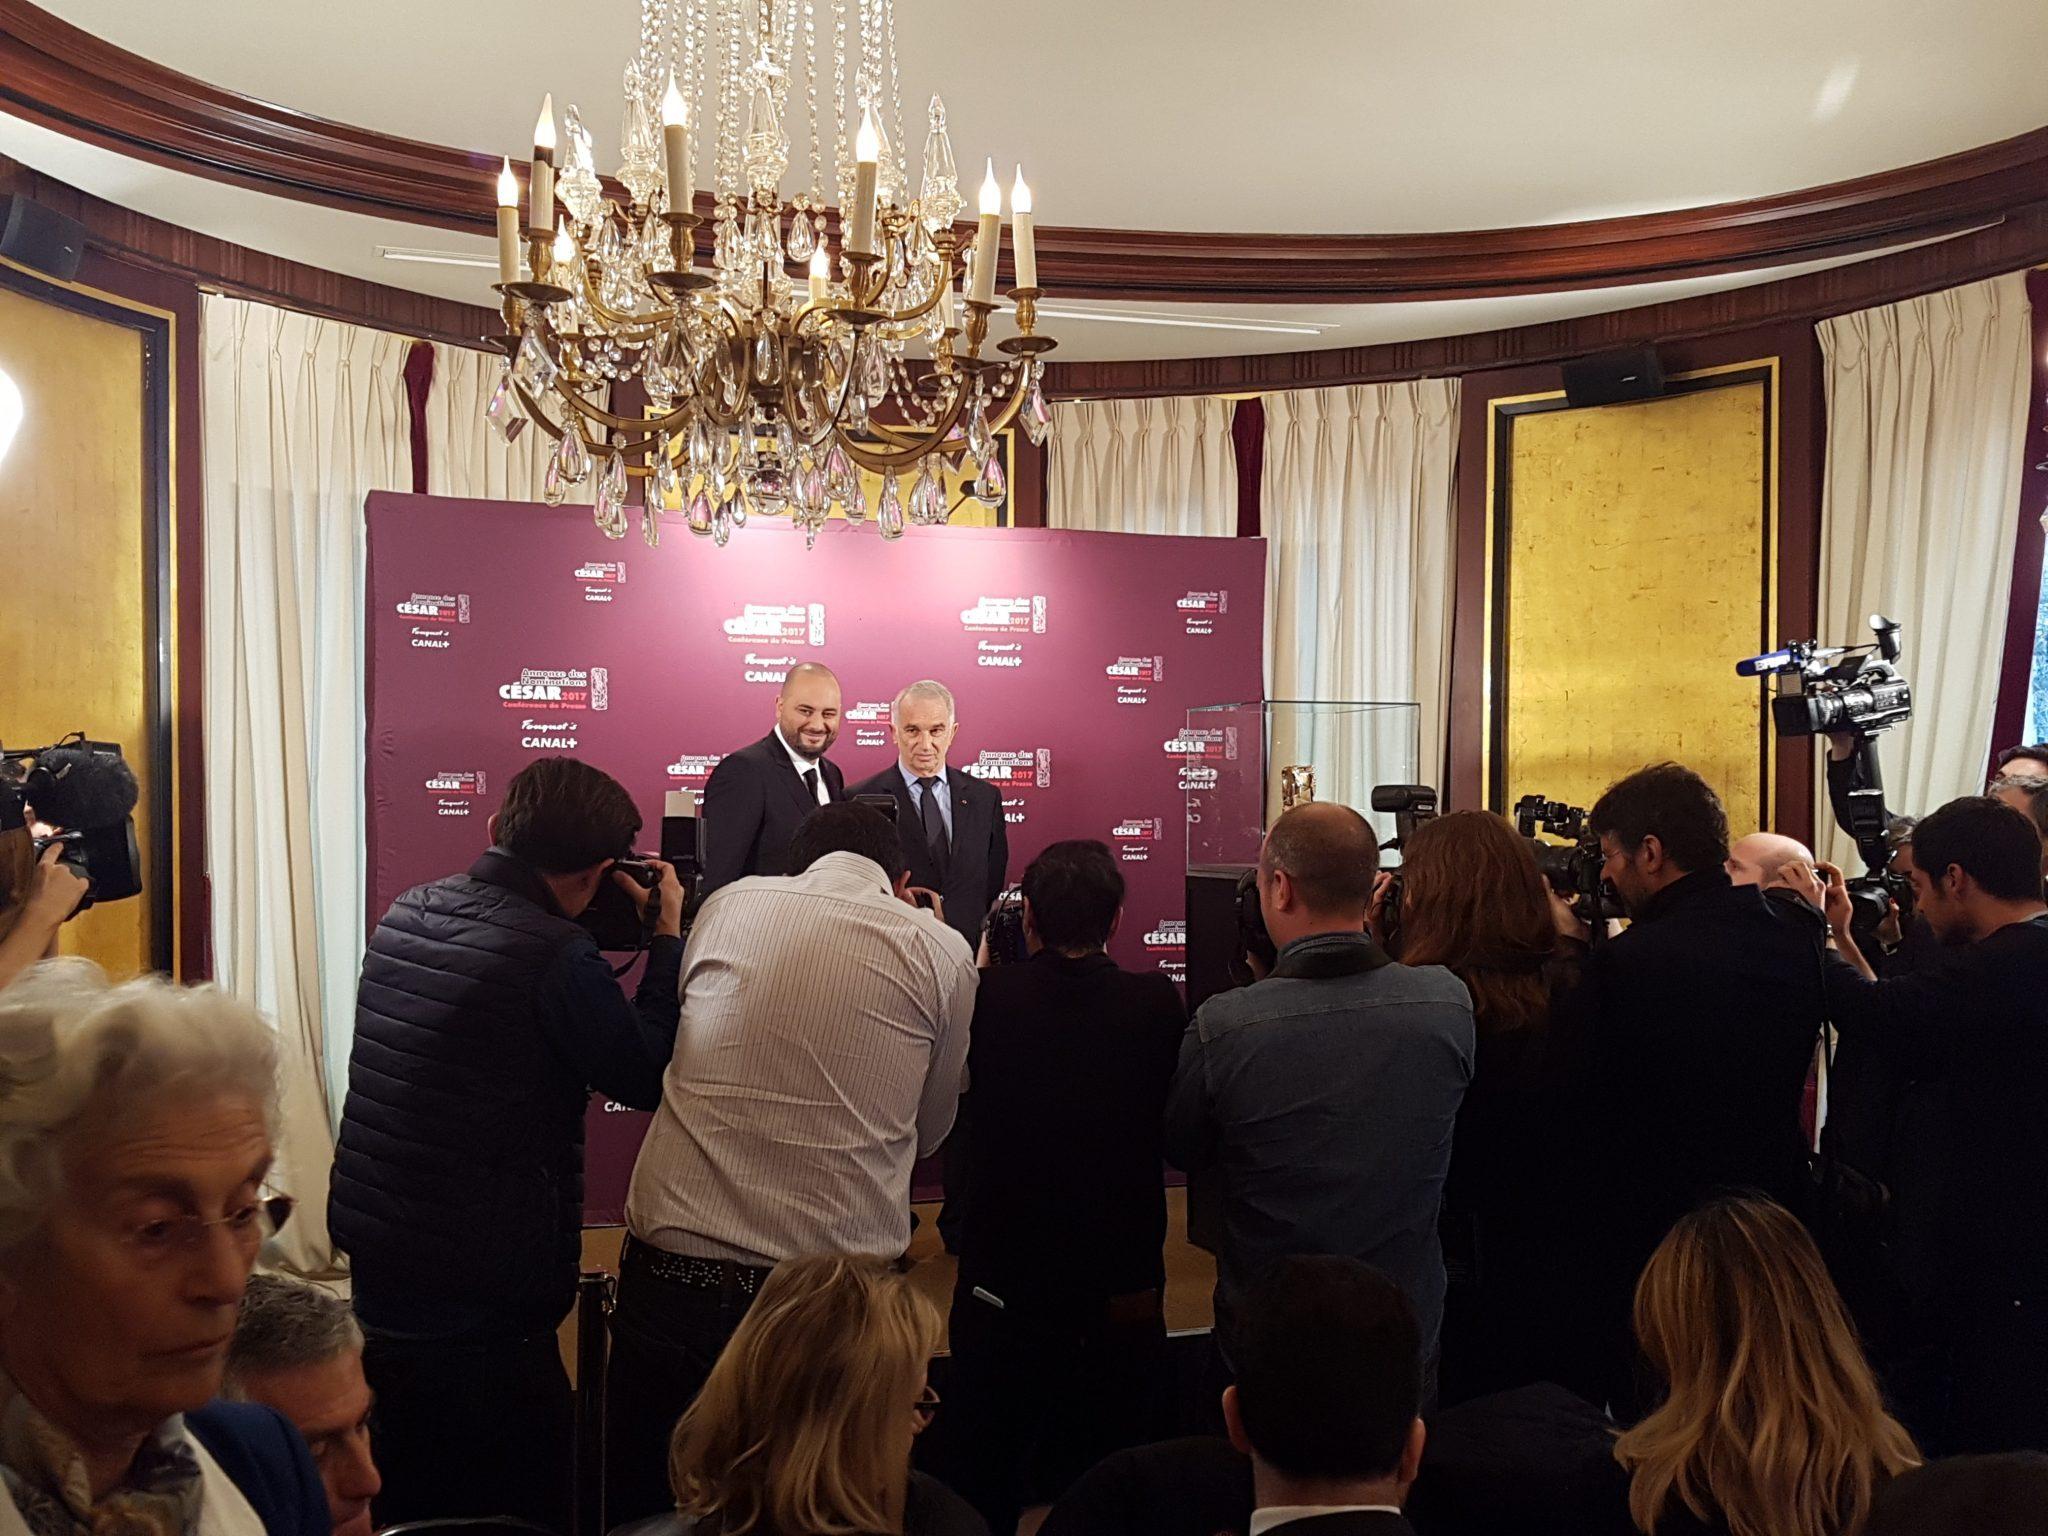 Cesar 2017 conference de presse nominations image 02